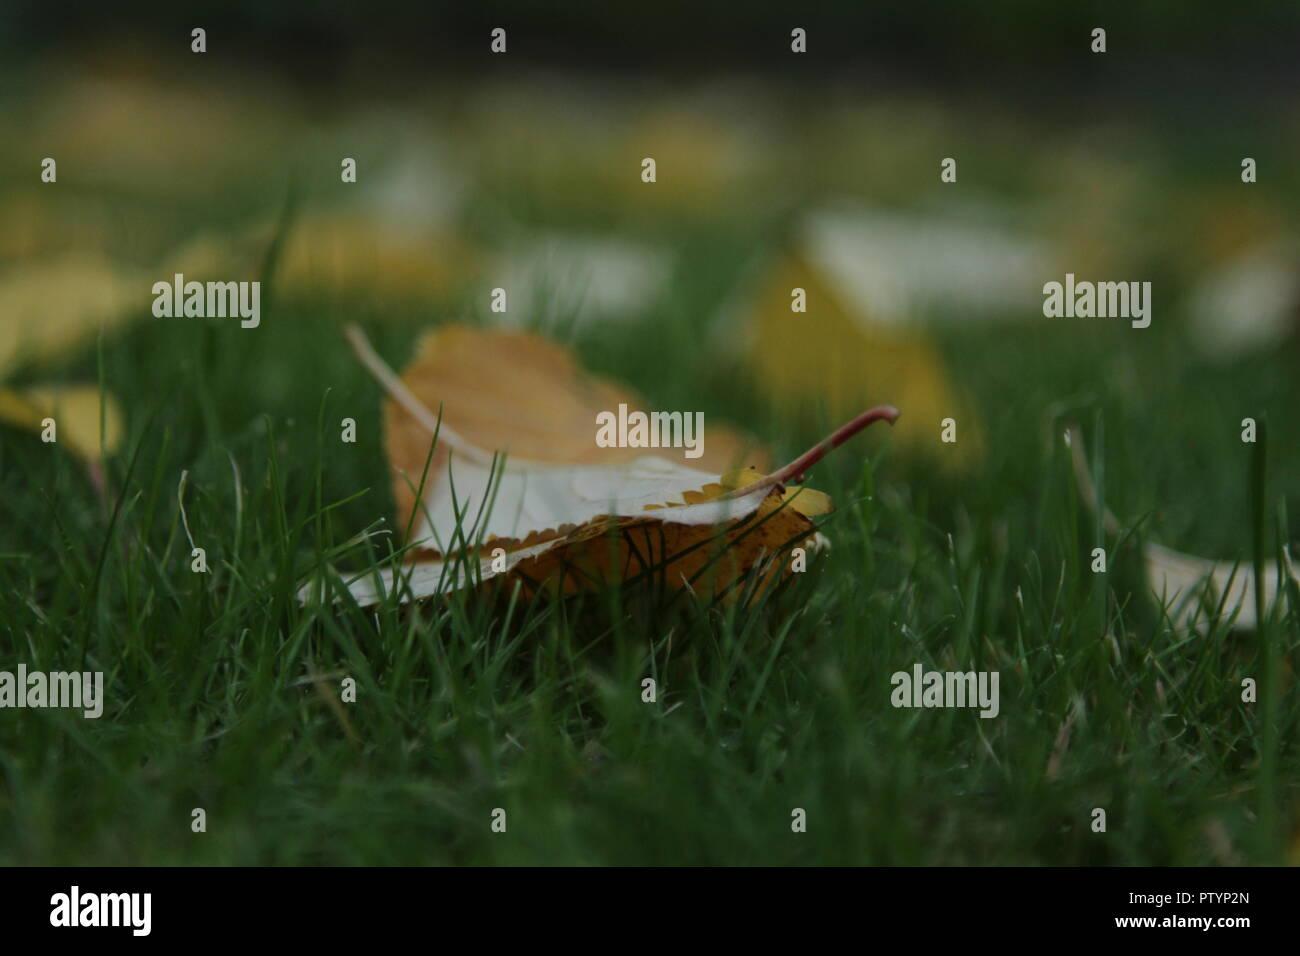 Autumn Leaves On Ground Focus - Stock Image